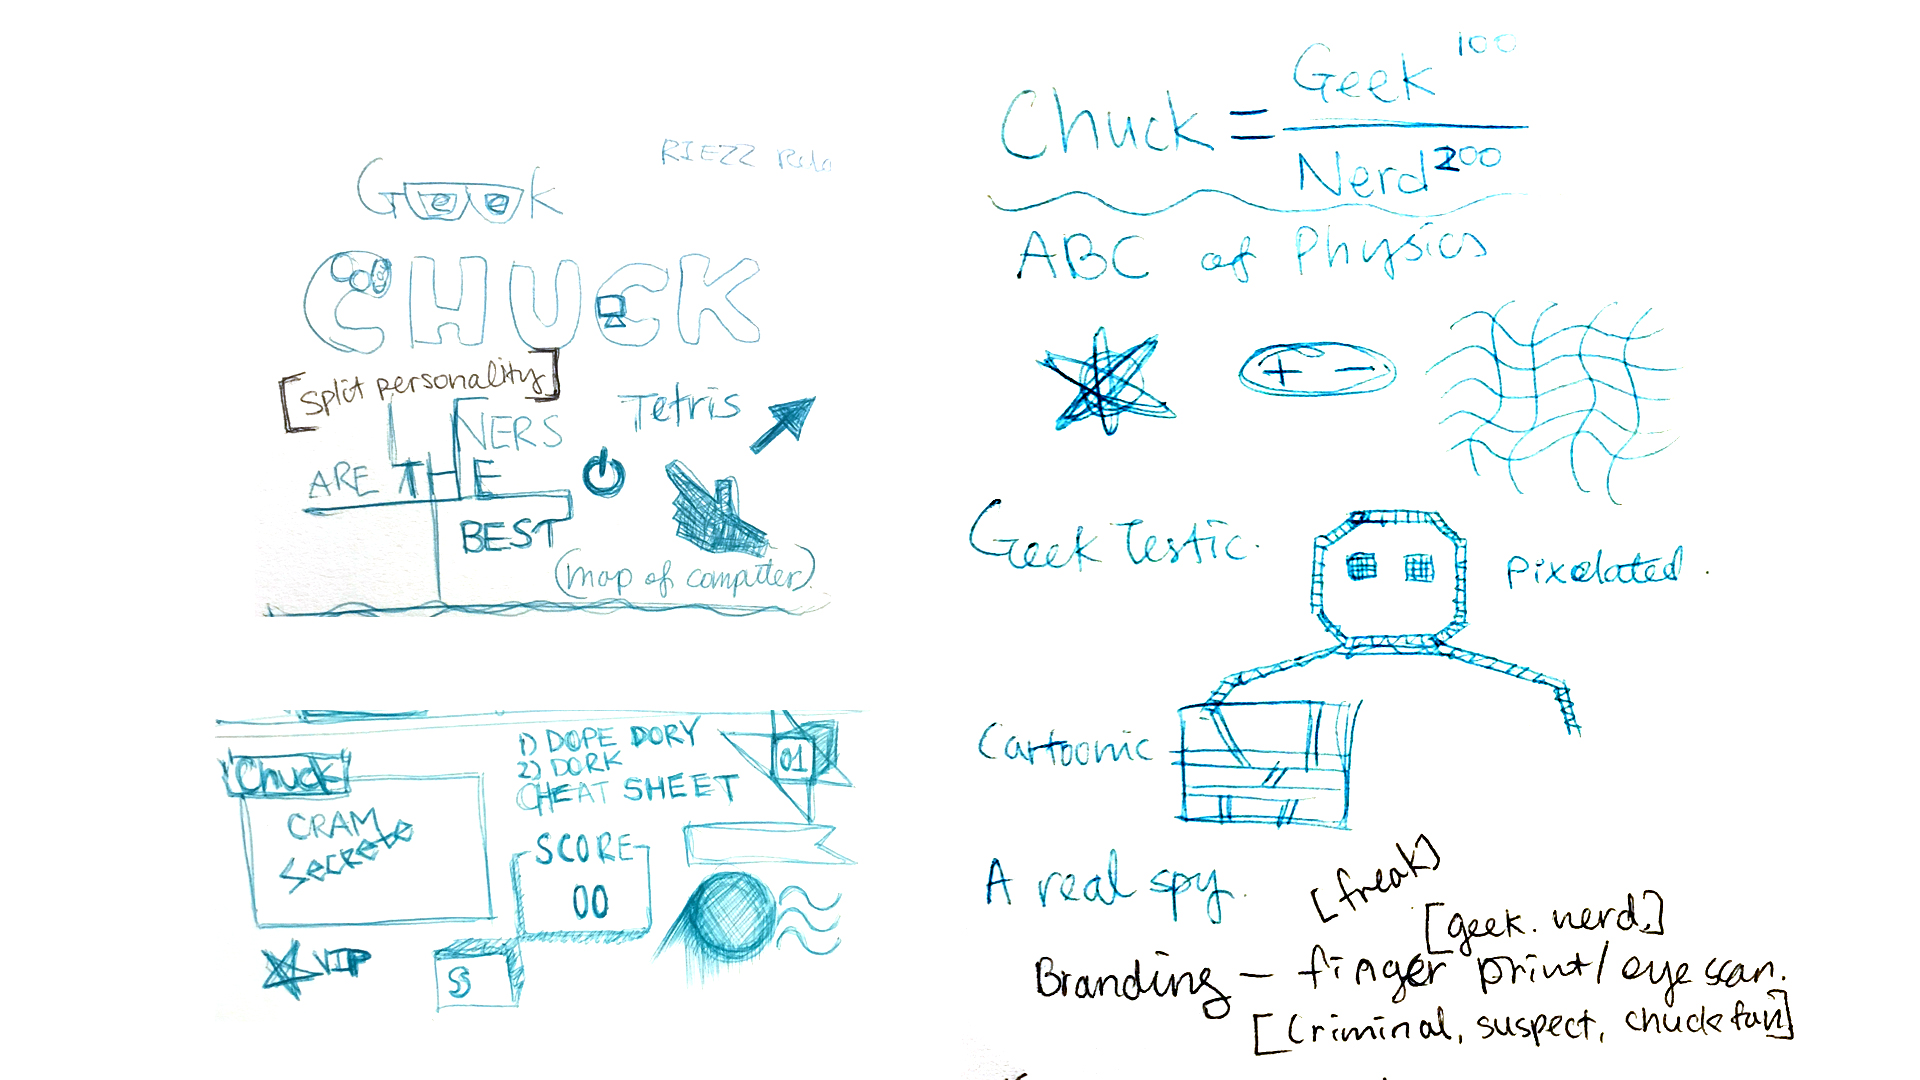 Chuck_sketch01.jpg